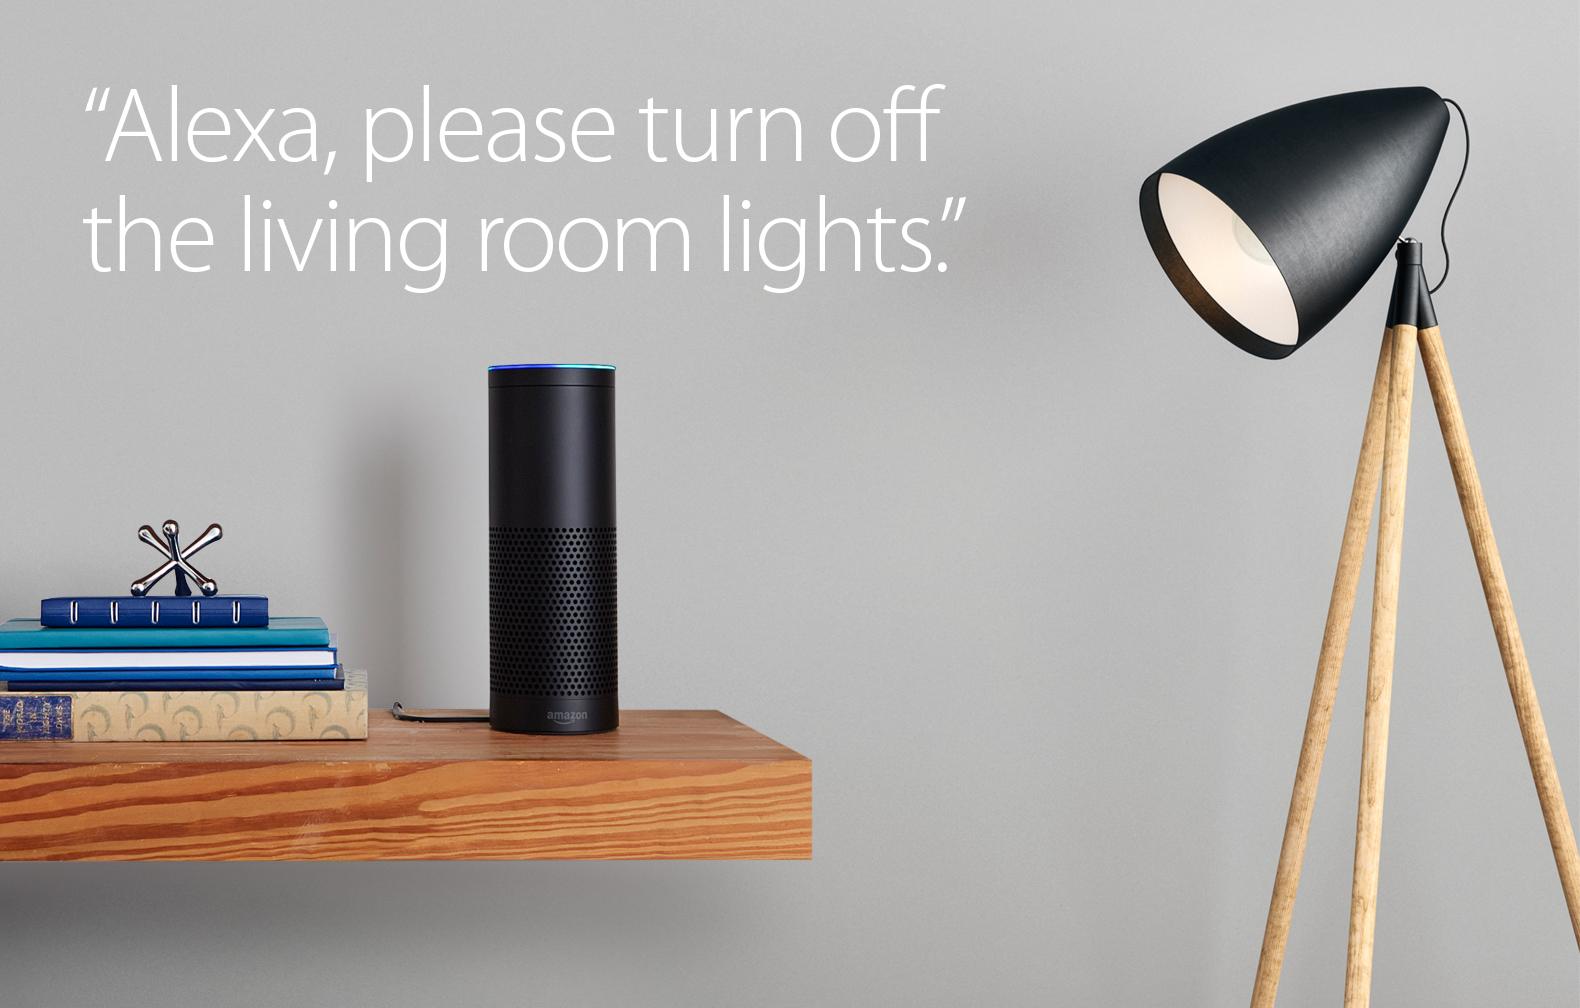 Smart Lights Alexa